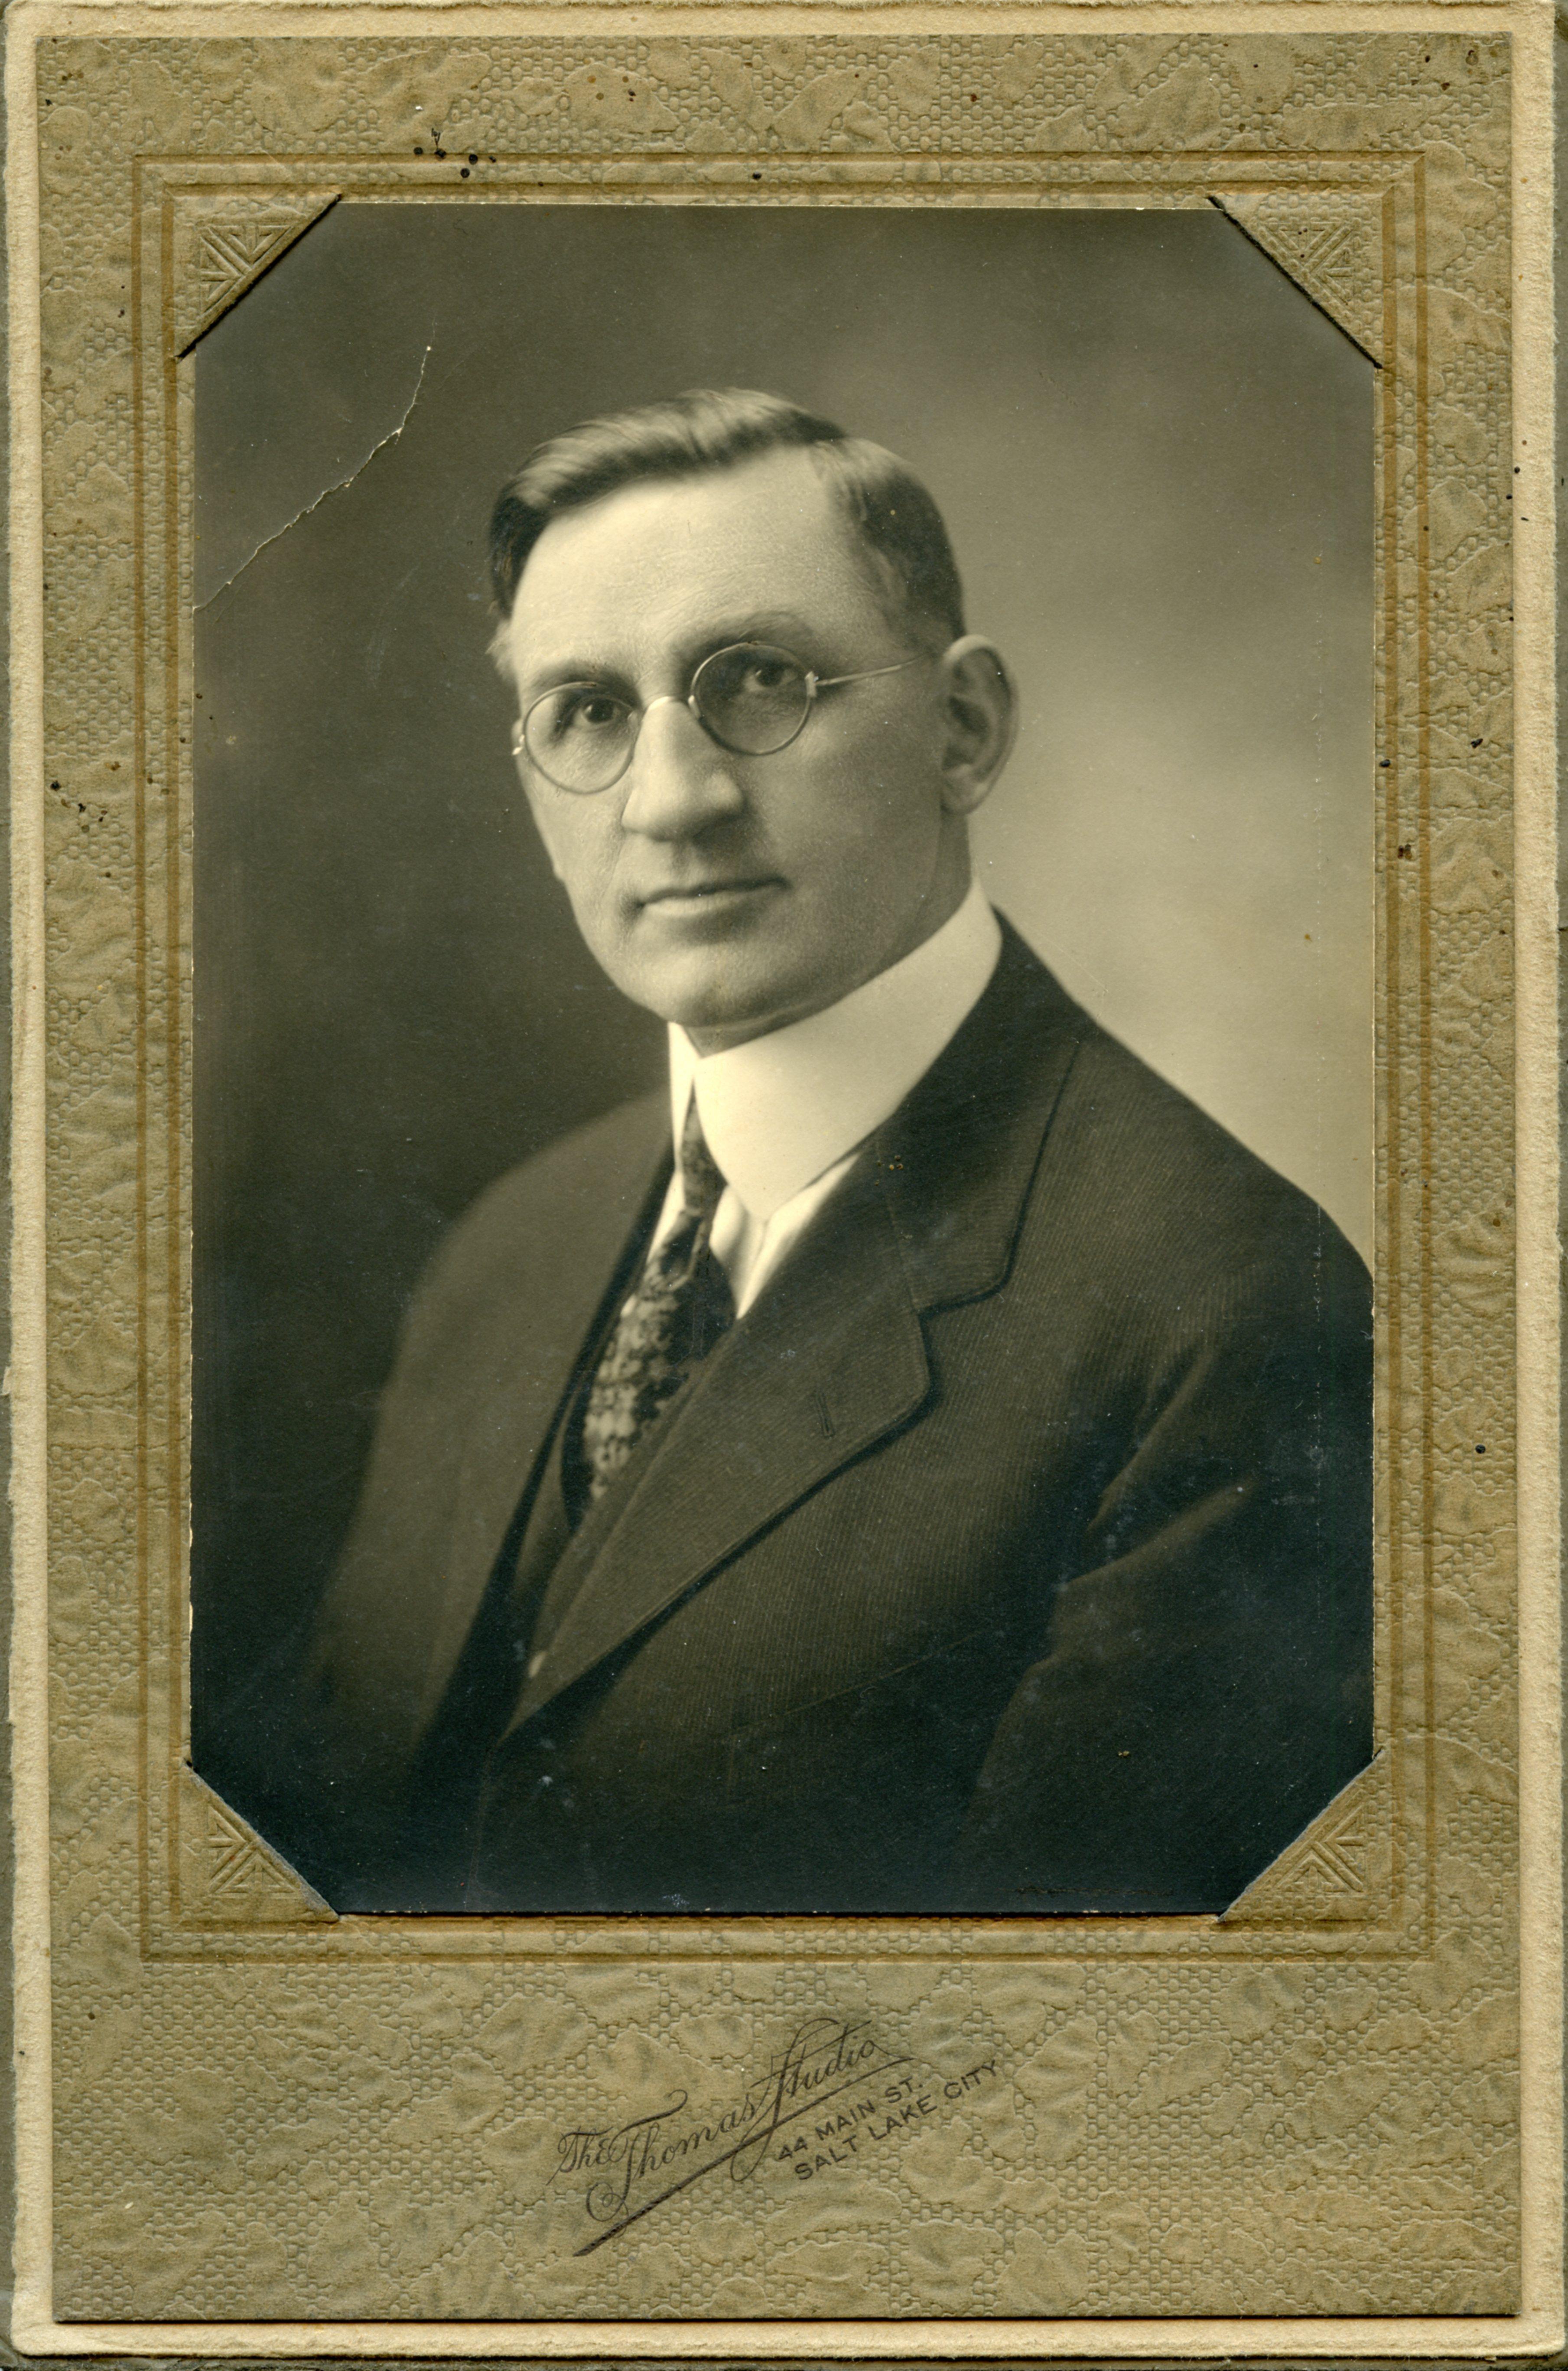 Lyman, Richard Roswell